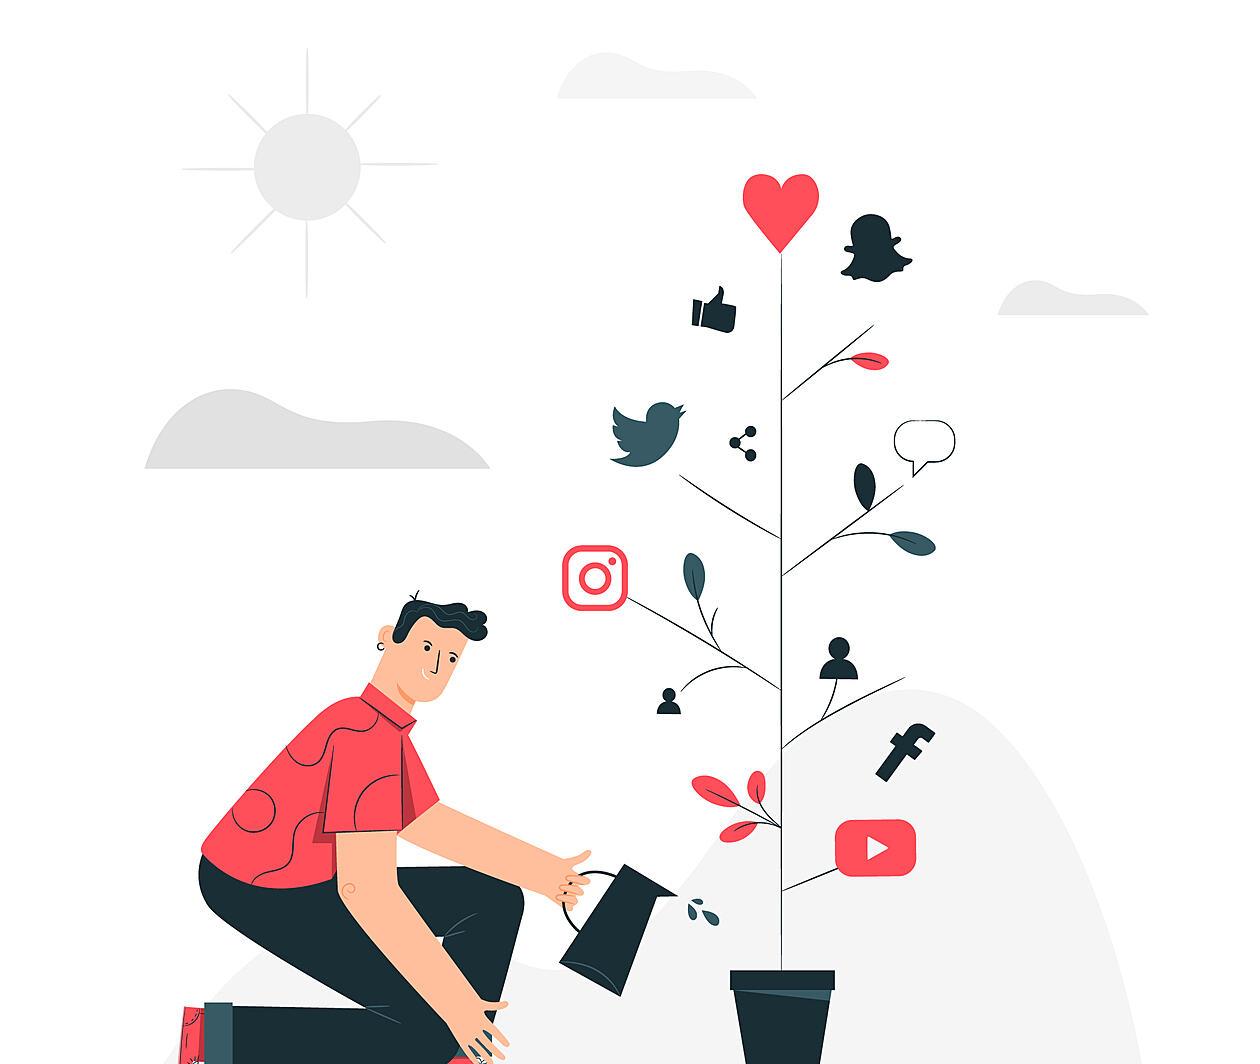 Branding in the Digital Era